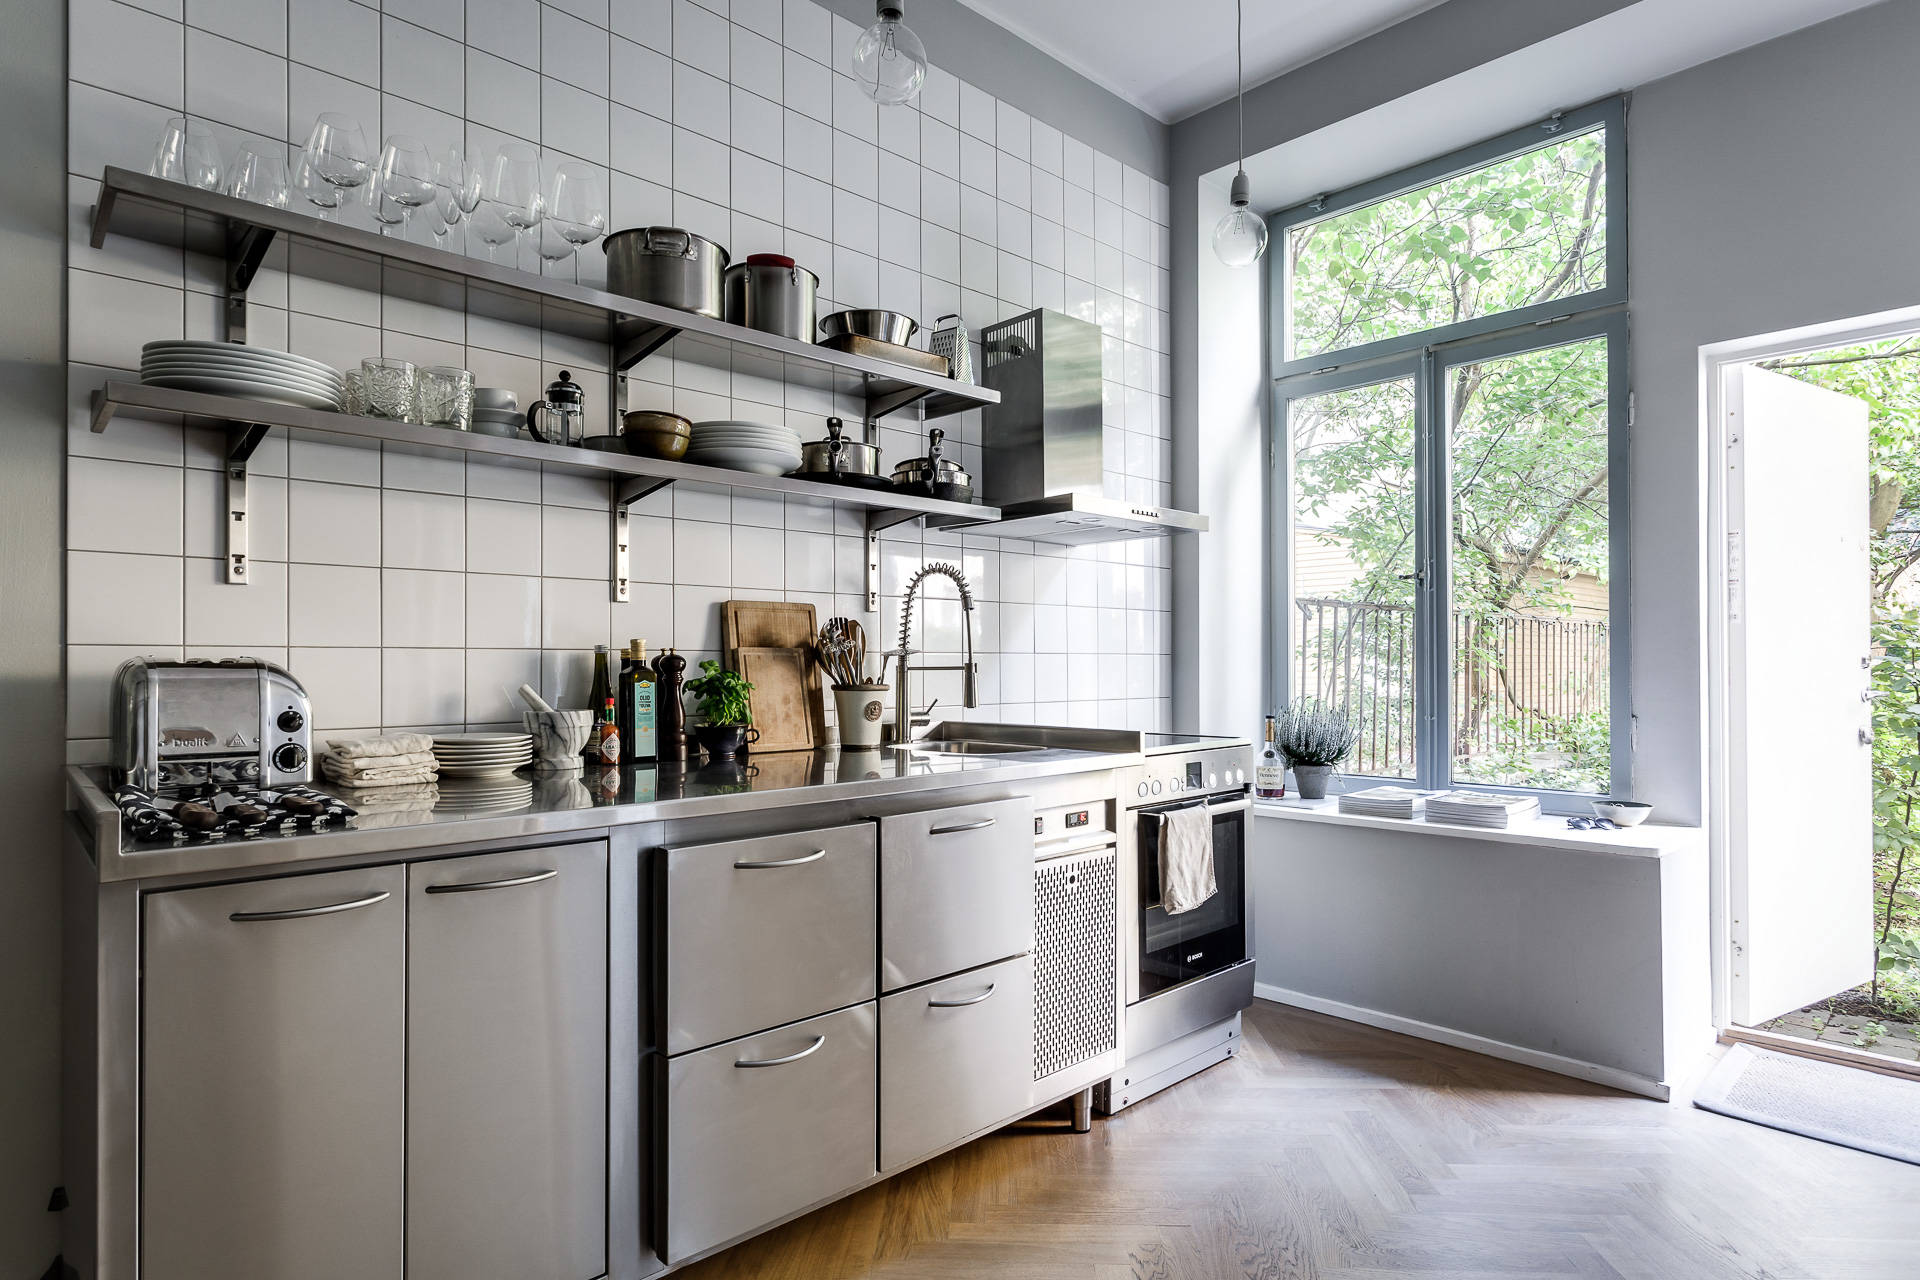 Peque a cocina inspirada en una profesional blog tienda for Decoracion cocina pequena moderna